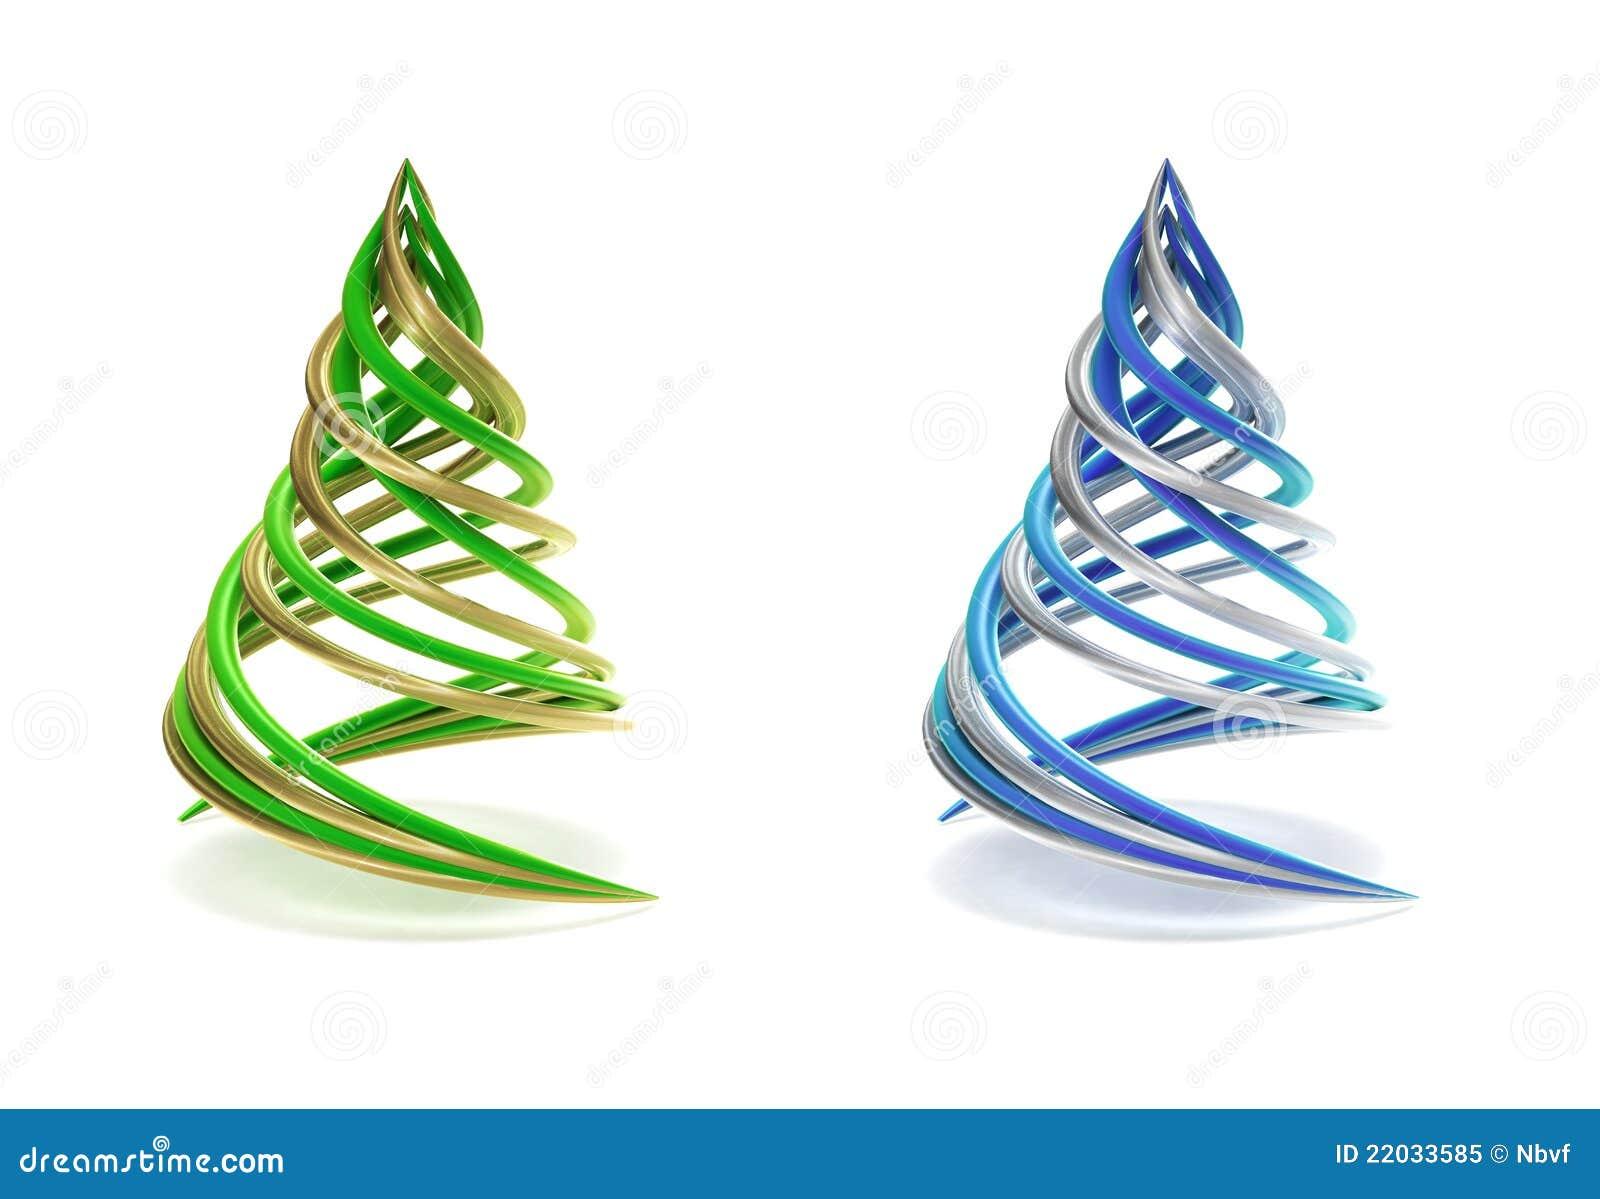 pair of symbolic and minimalist christmas tree stock. Black Bedroom Furniture Sets. Home Design Ideas